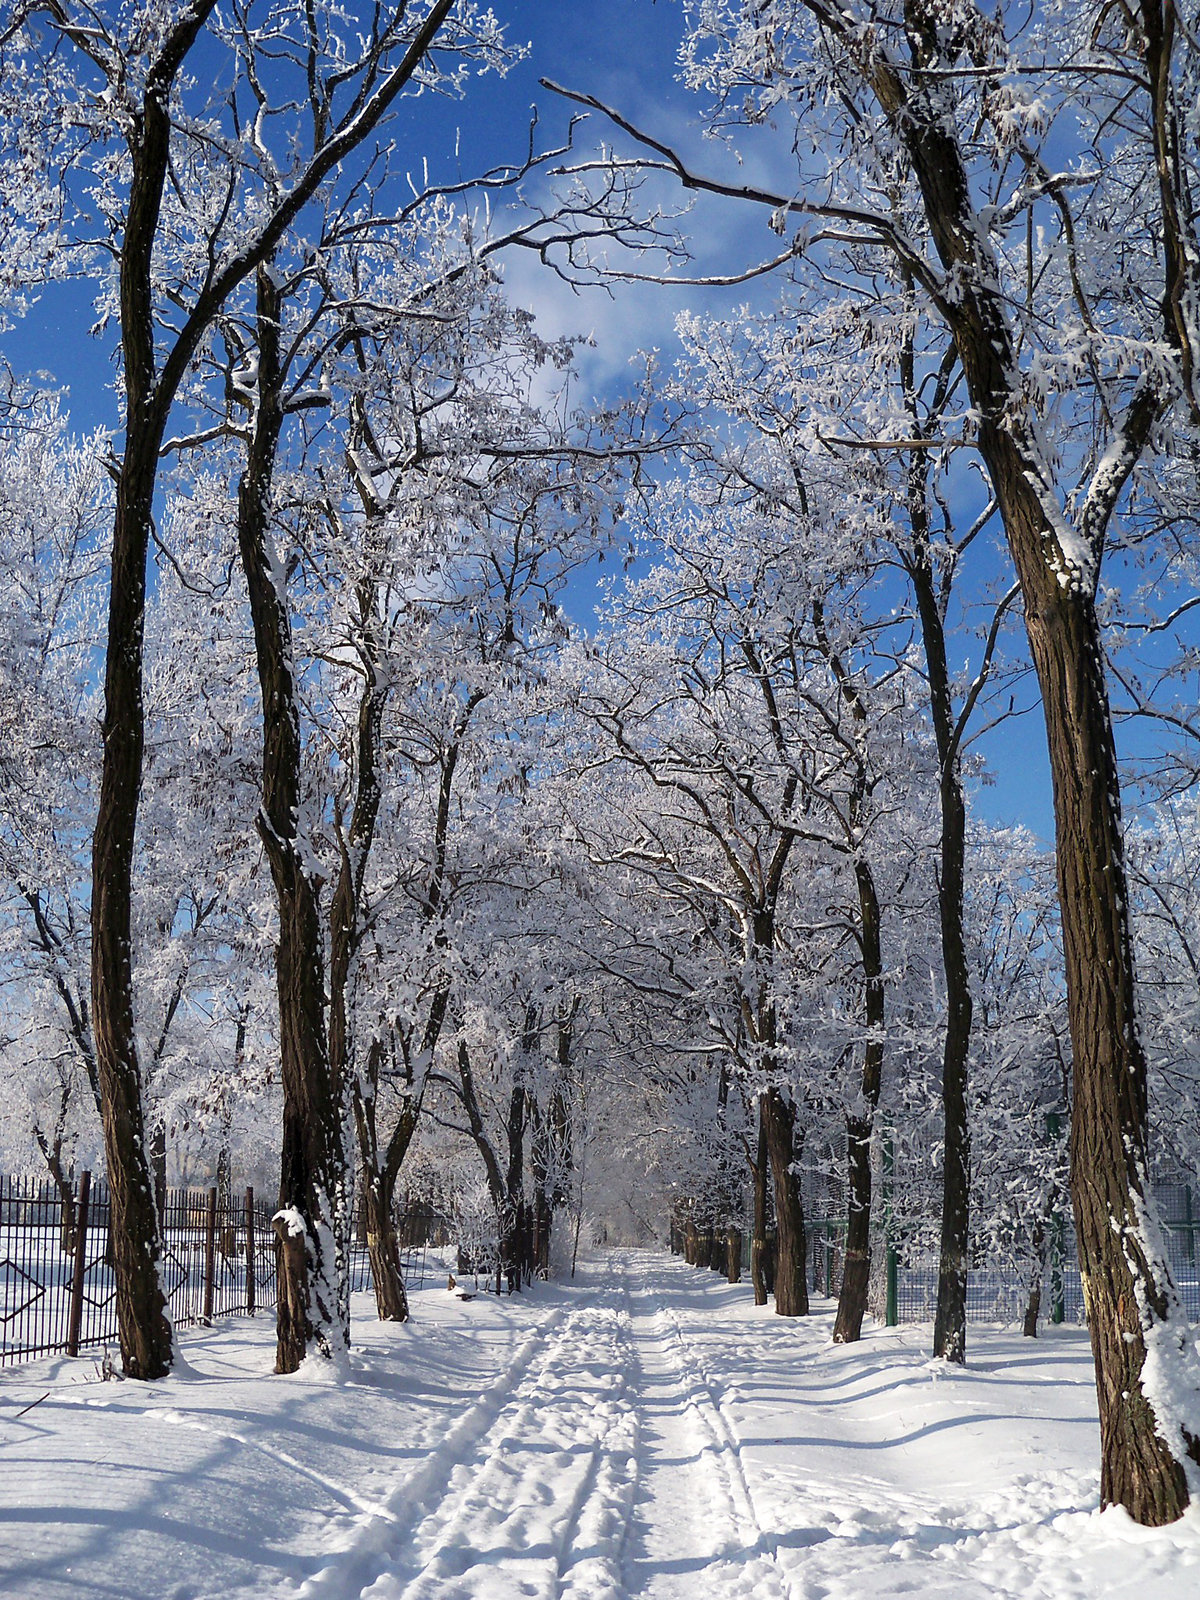 картинки зимнего парка посвящена